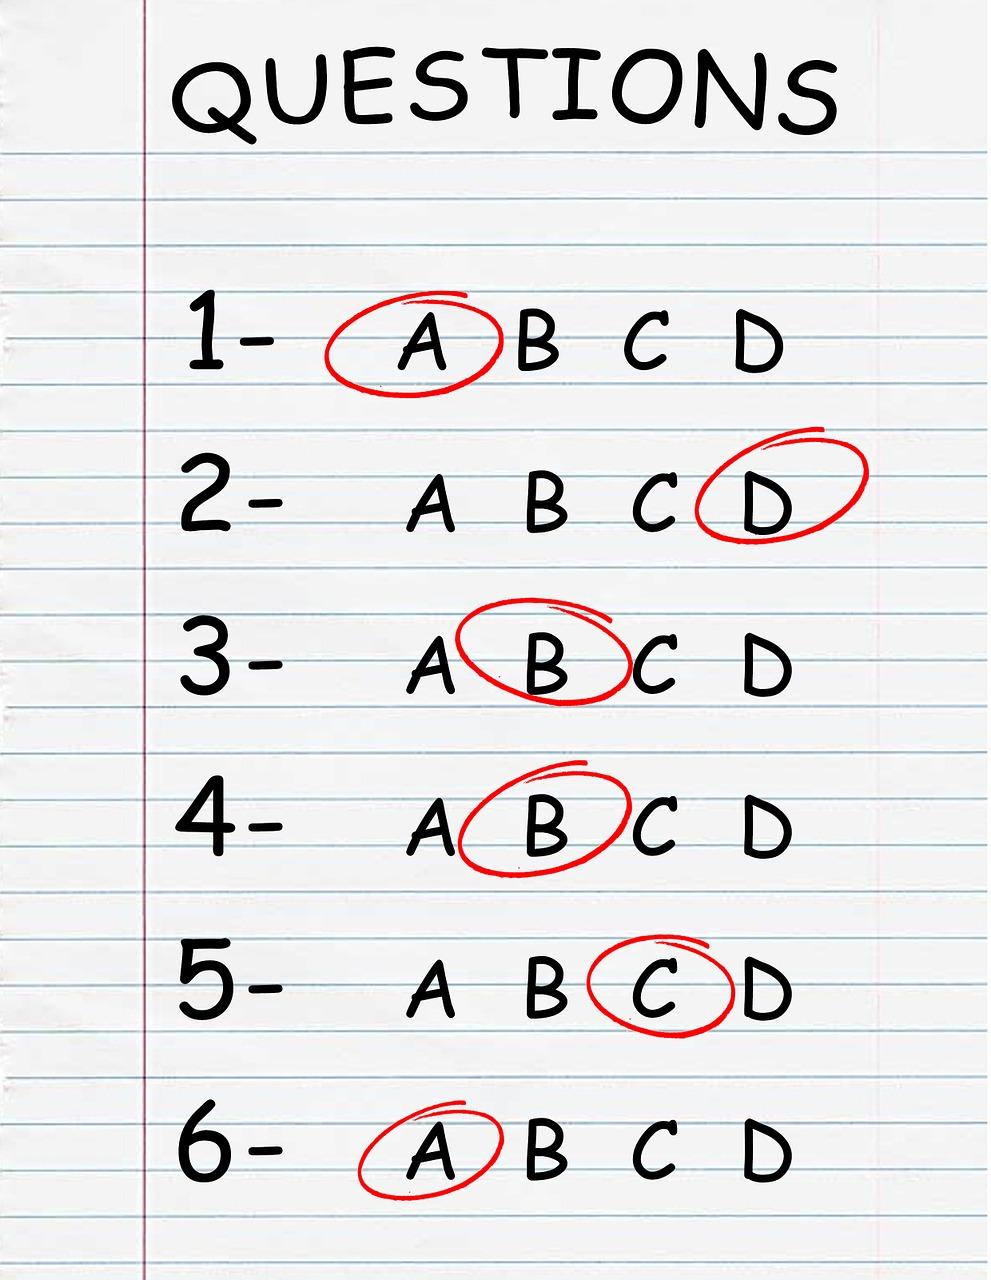 Soal Ipa Kelas 9 Pdf